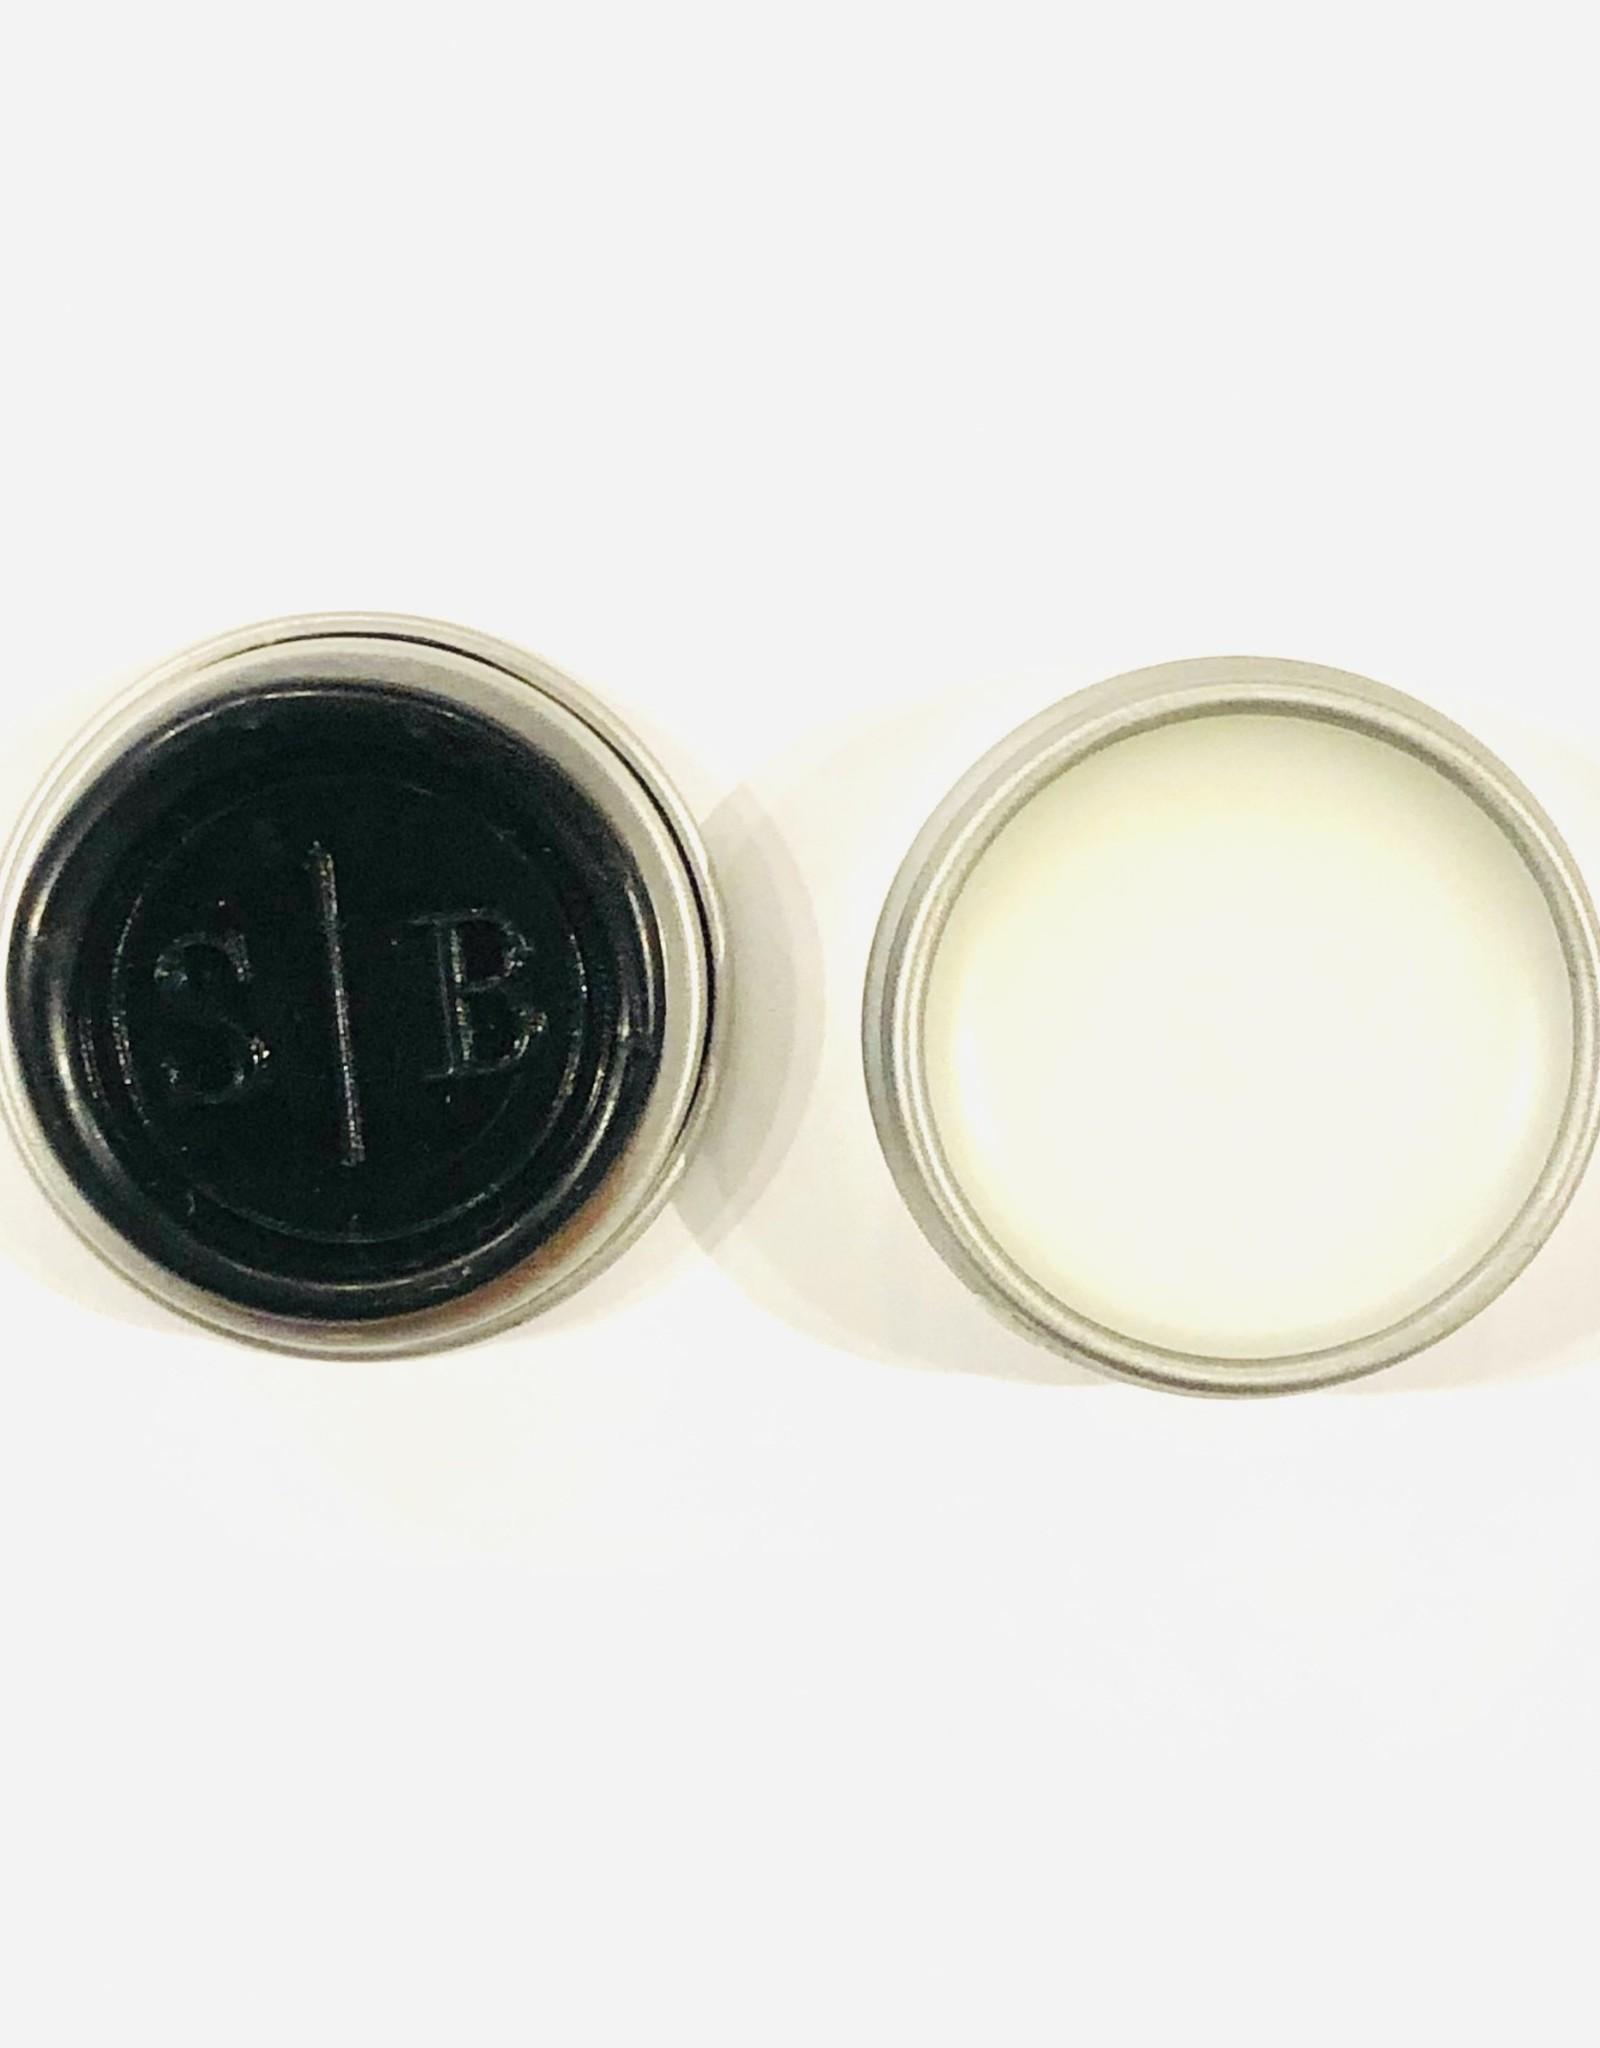 Scandic Botanica 0.25 oz Scandic lip treatment